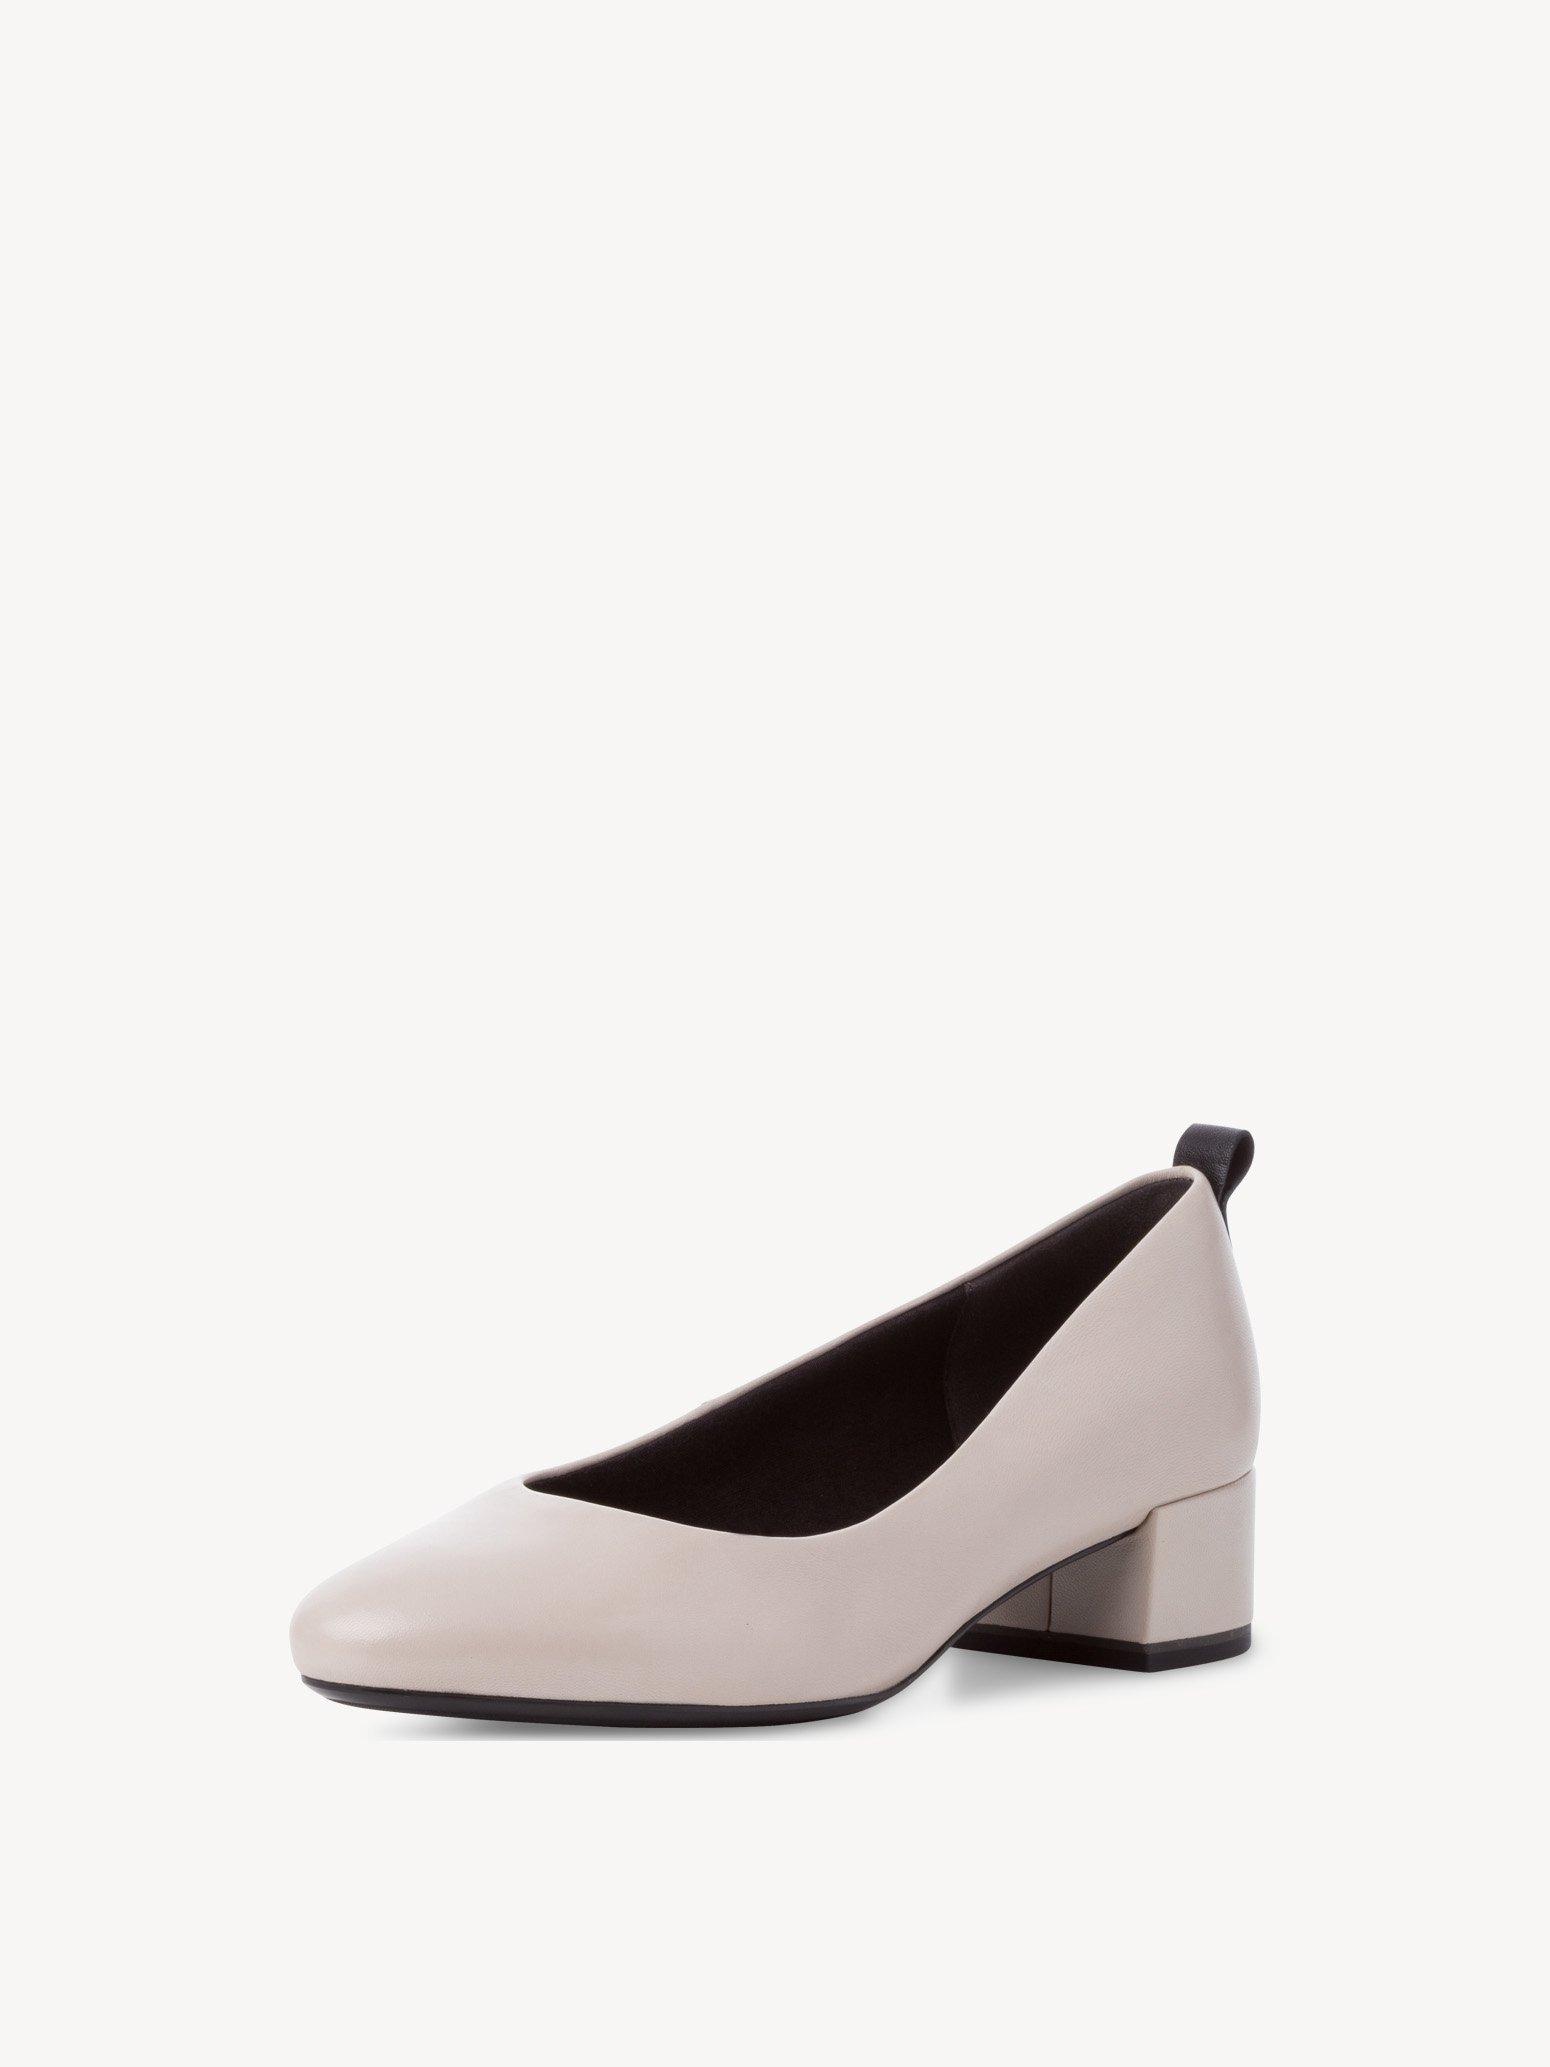 Туфли лодочки Tamaris 1-1-22301-27-451